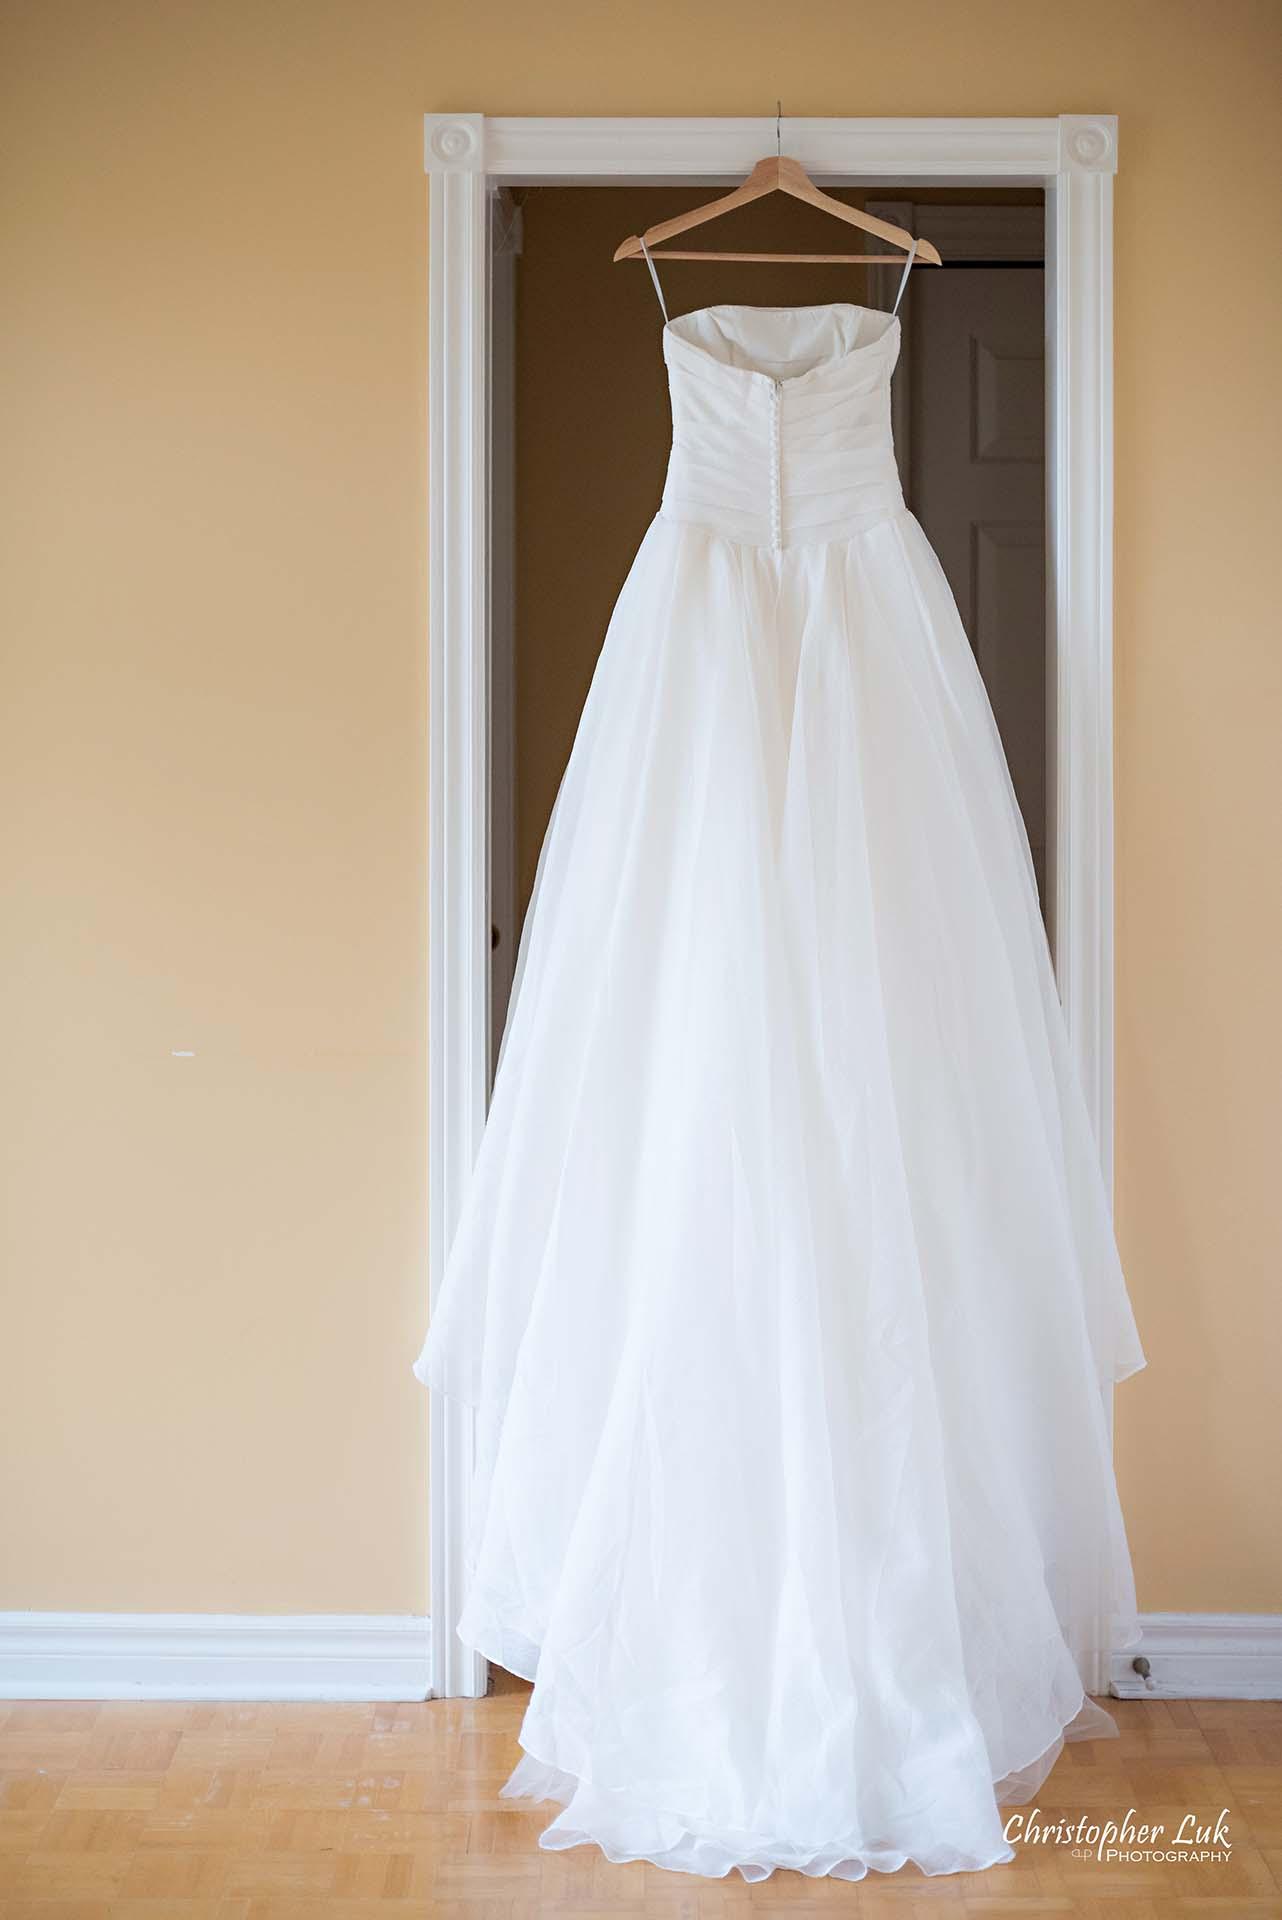 Christopher Luk Toronto Wedding Photographer Bride Getting Ready Preparations Bridal White Gown Dress Hanging Back Train